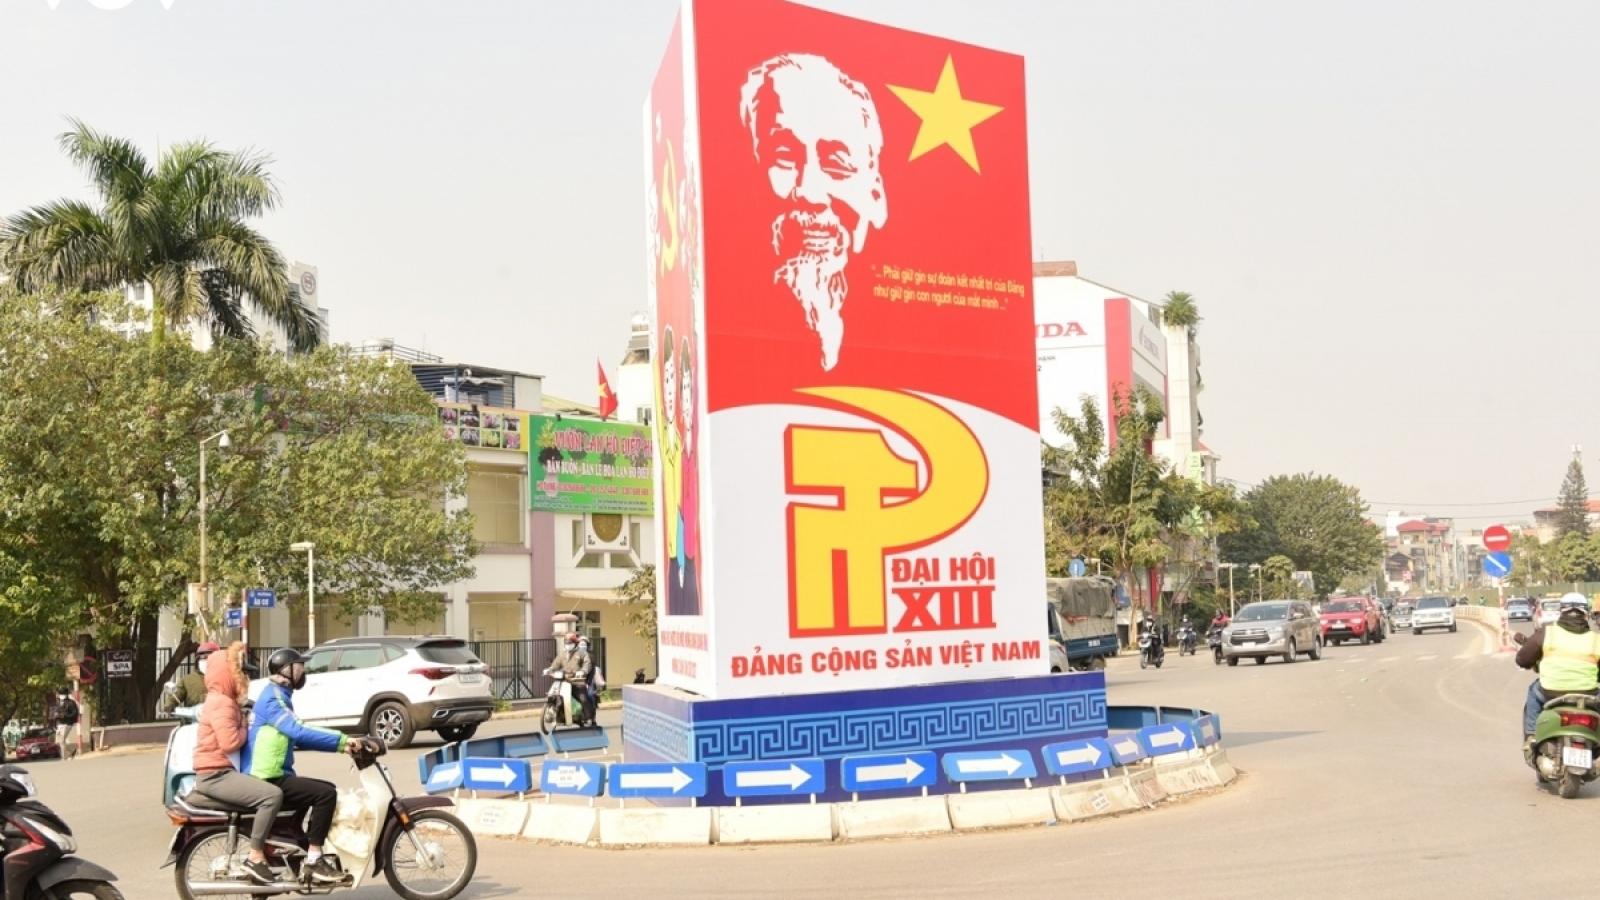 Experts remain optimistic about Vietnamese development path